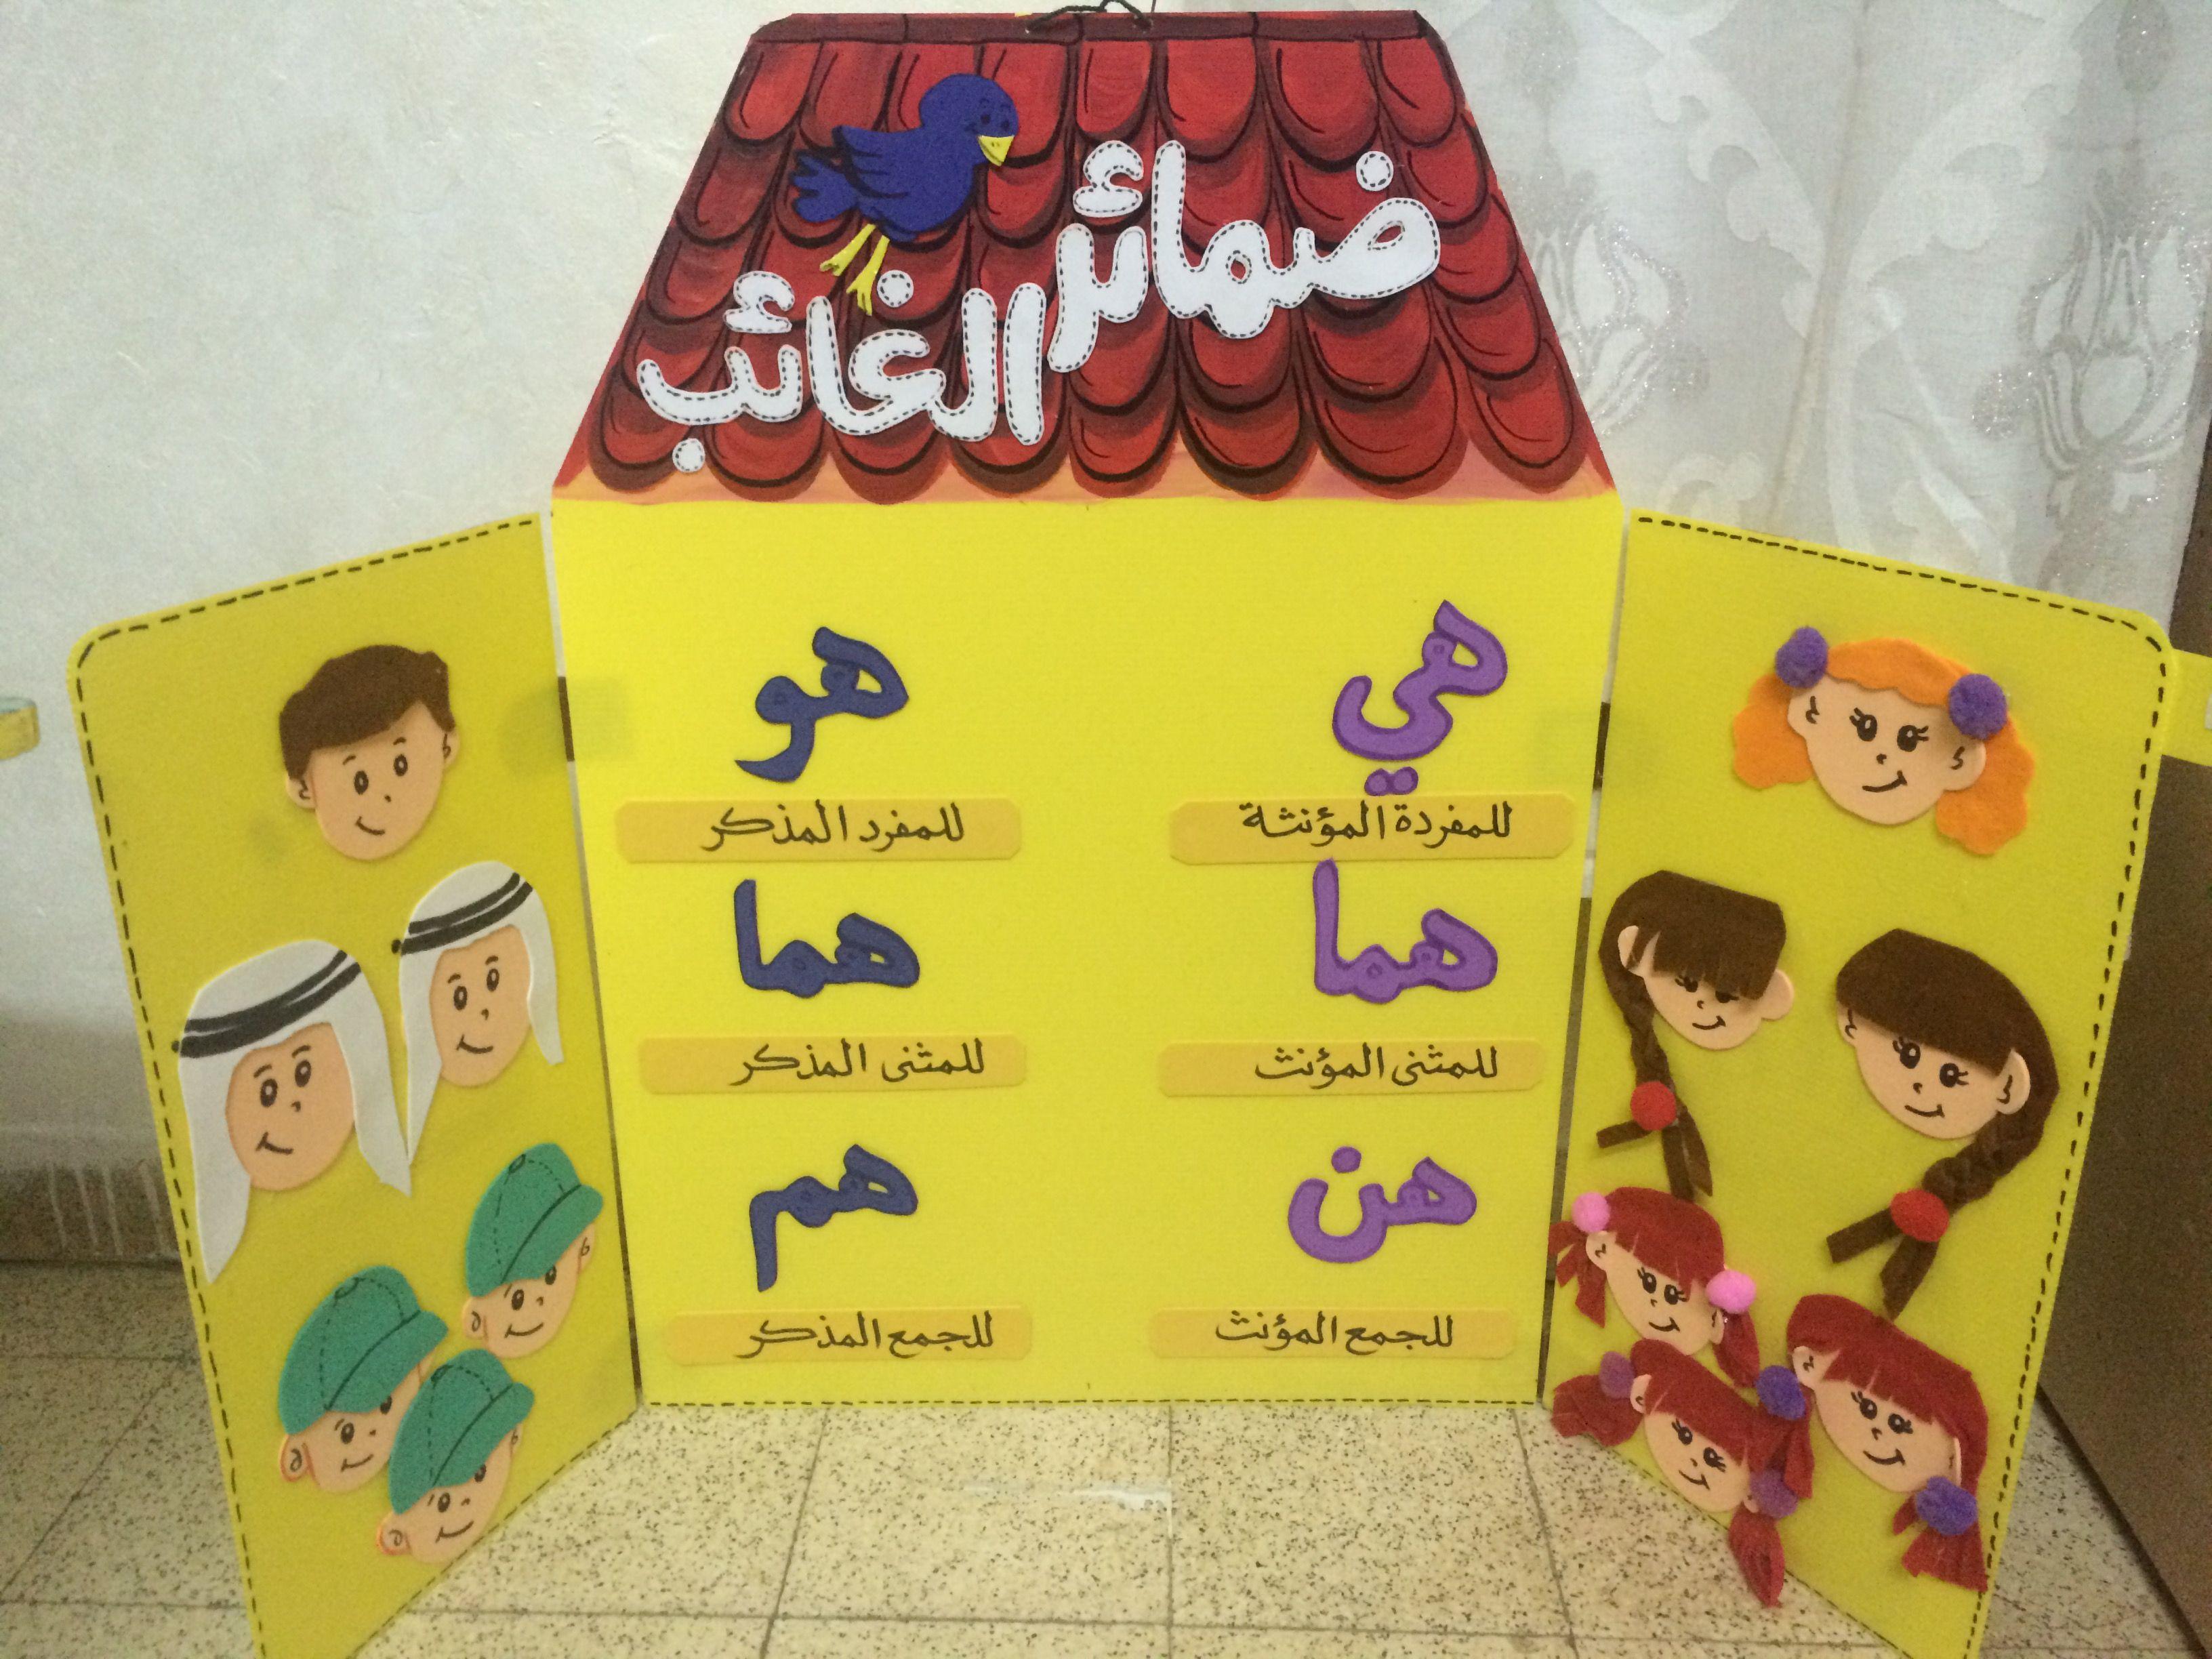 ضمائر الغائب Arabic Alphabet For Kids Learning Arabic Arabic Kids